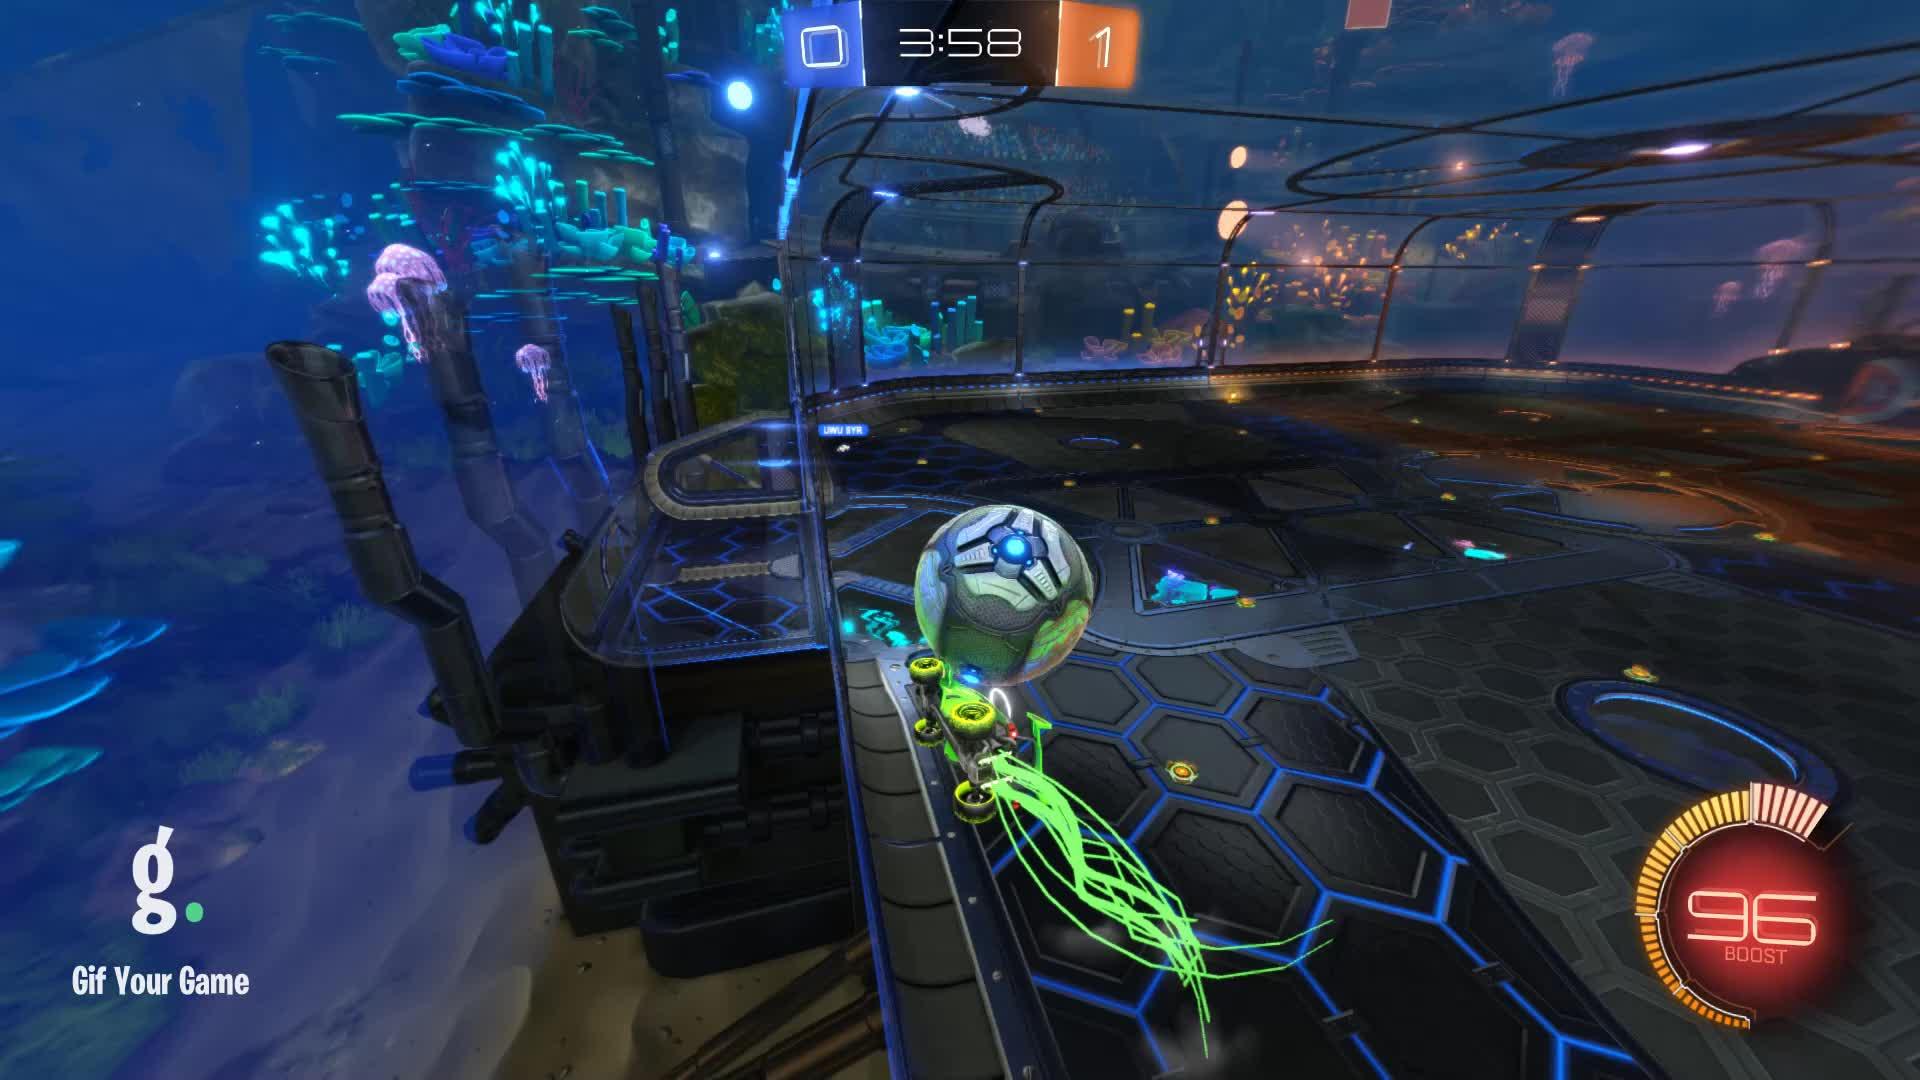 Gif Your Game, GifYourGame, Goal, Rocket League, RocketLeague, Zoar, Goal 2: Zoar GIFs